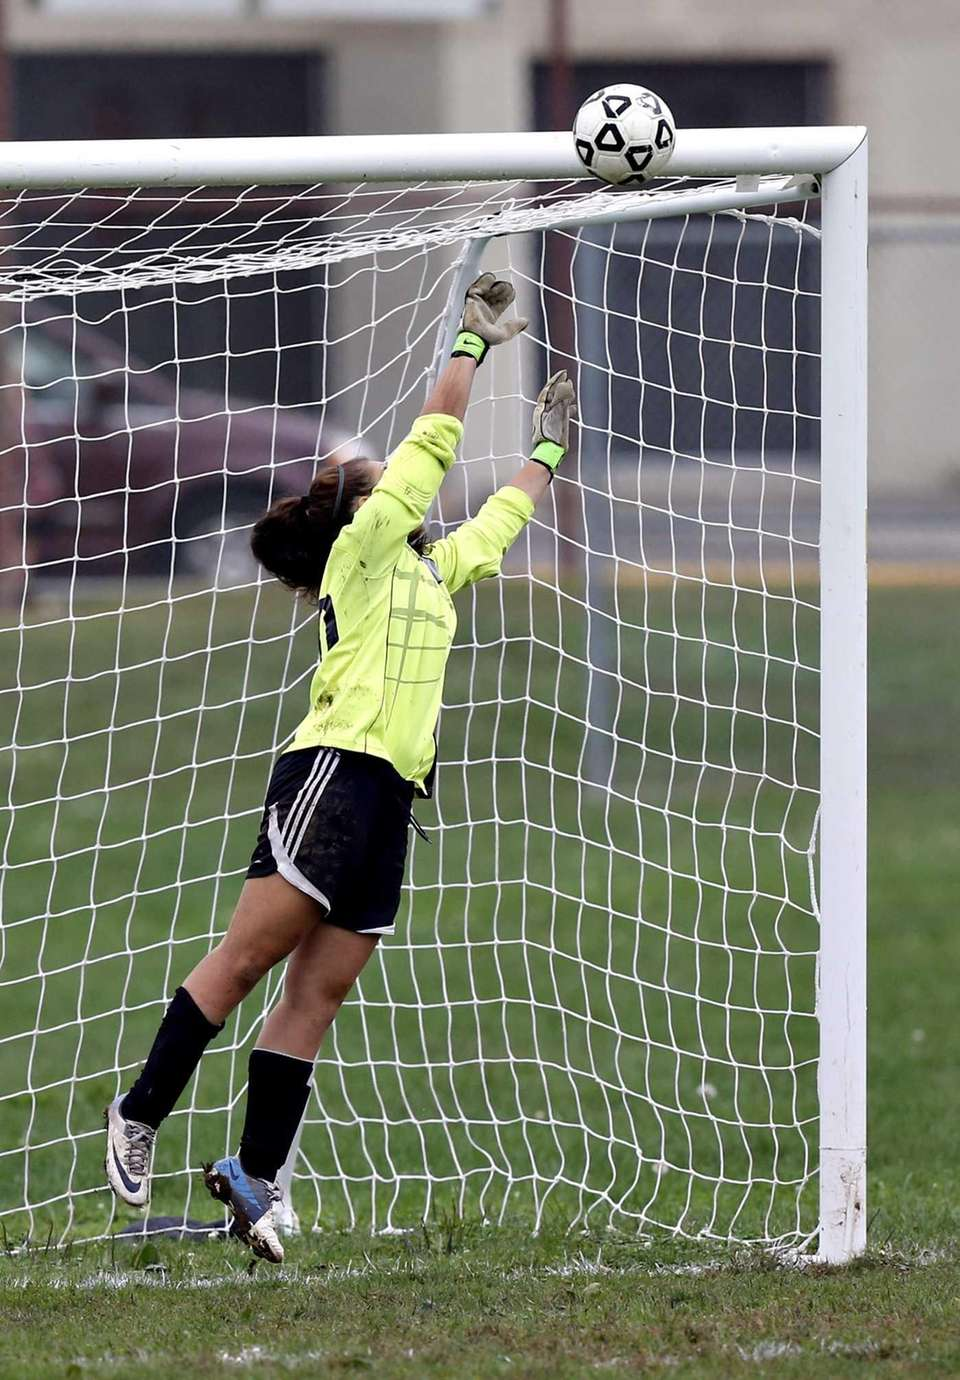 North Babylon goalkeeper Angela DiFazio is unable to